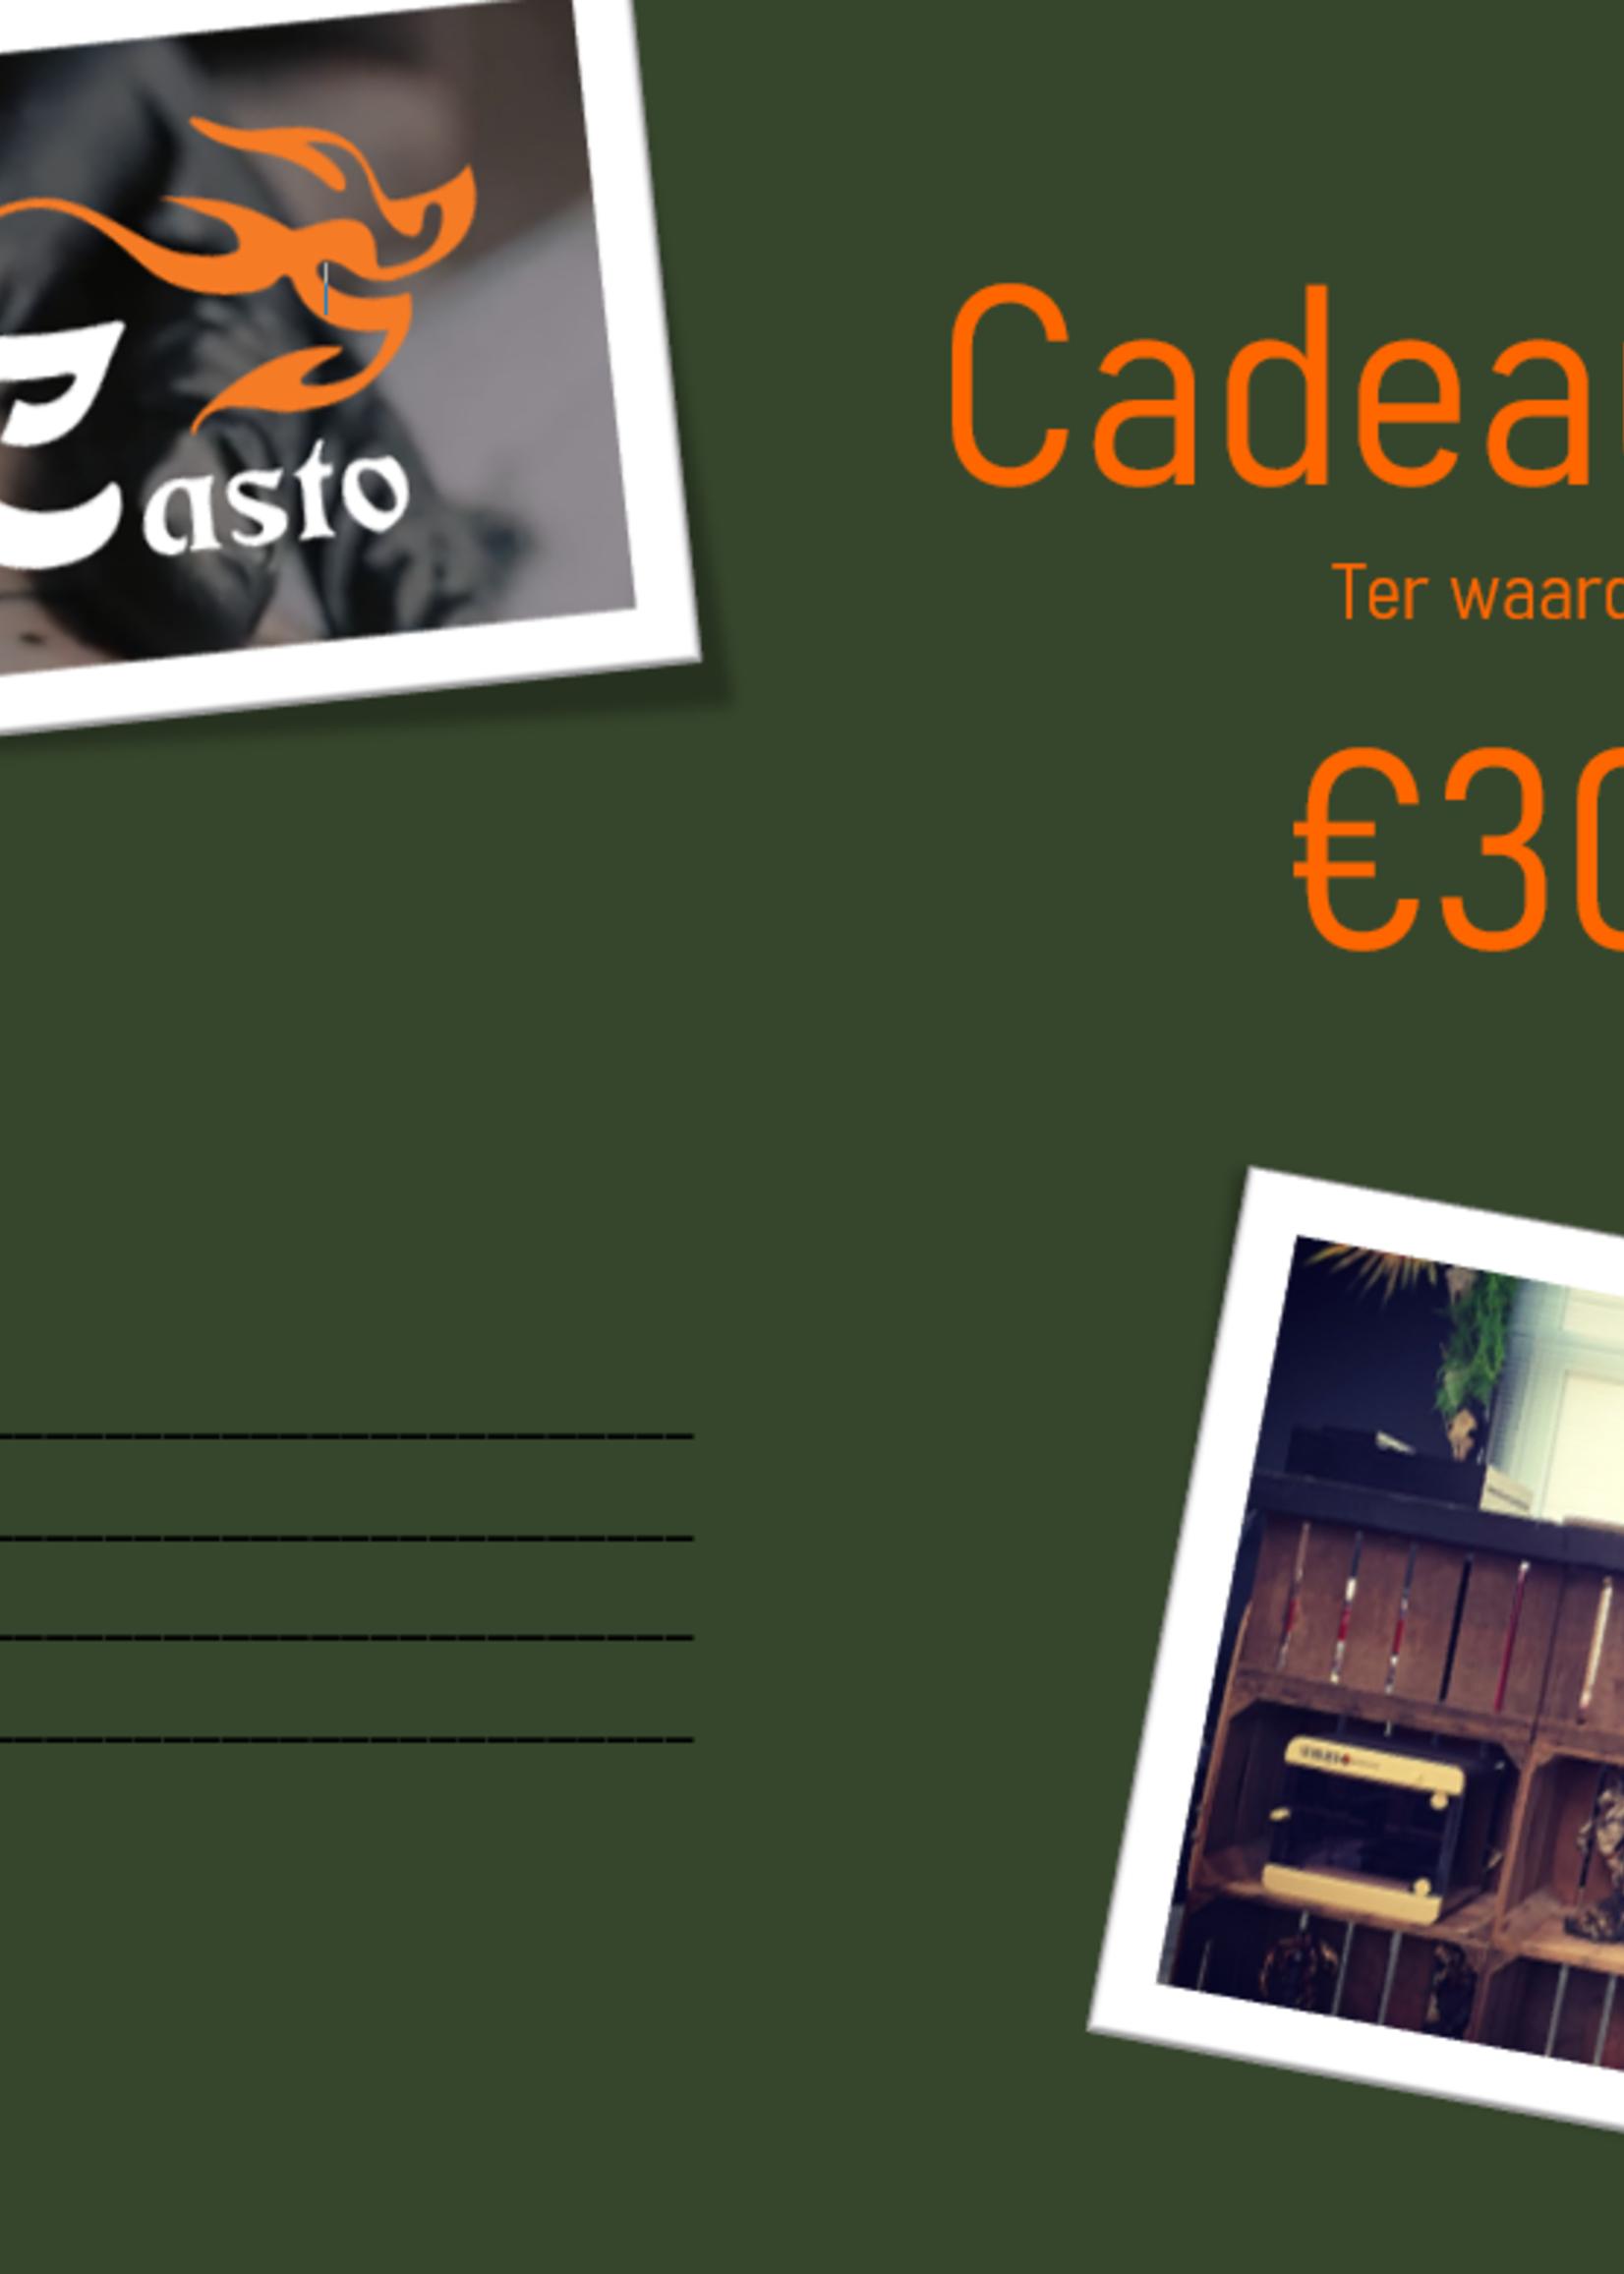 Tattoo Il Casto Cadeaubon - Tattoo il Casto - €30,-